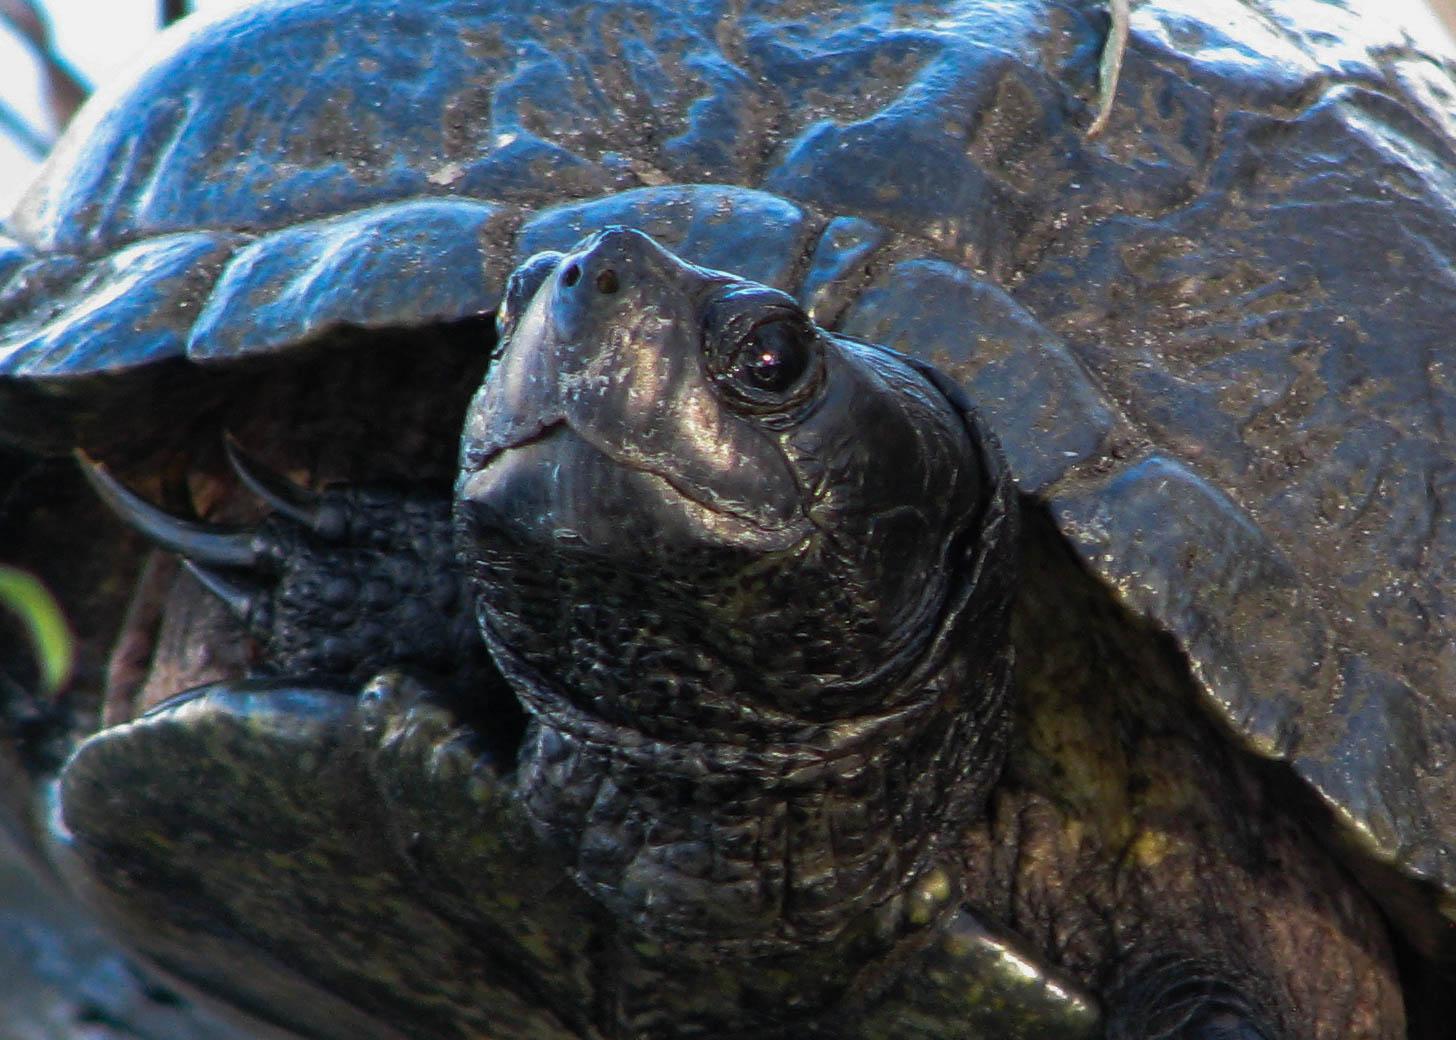 Head shot of turtle.